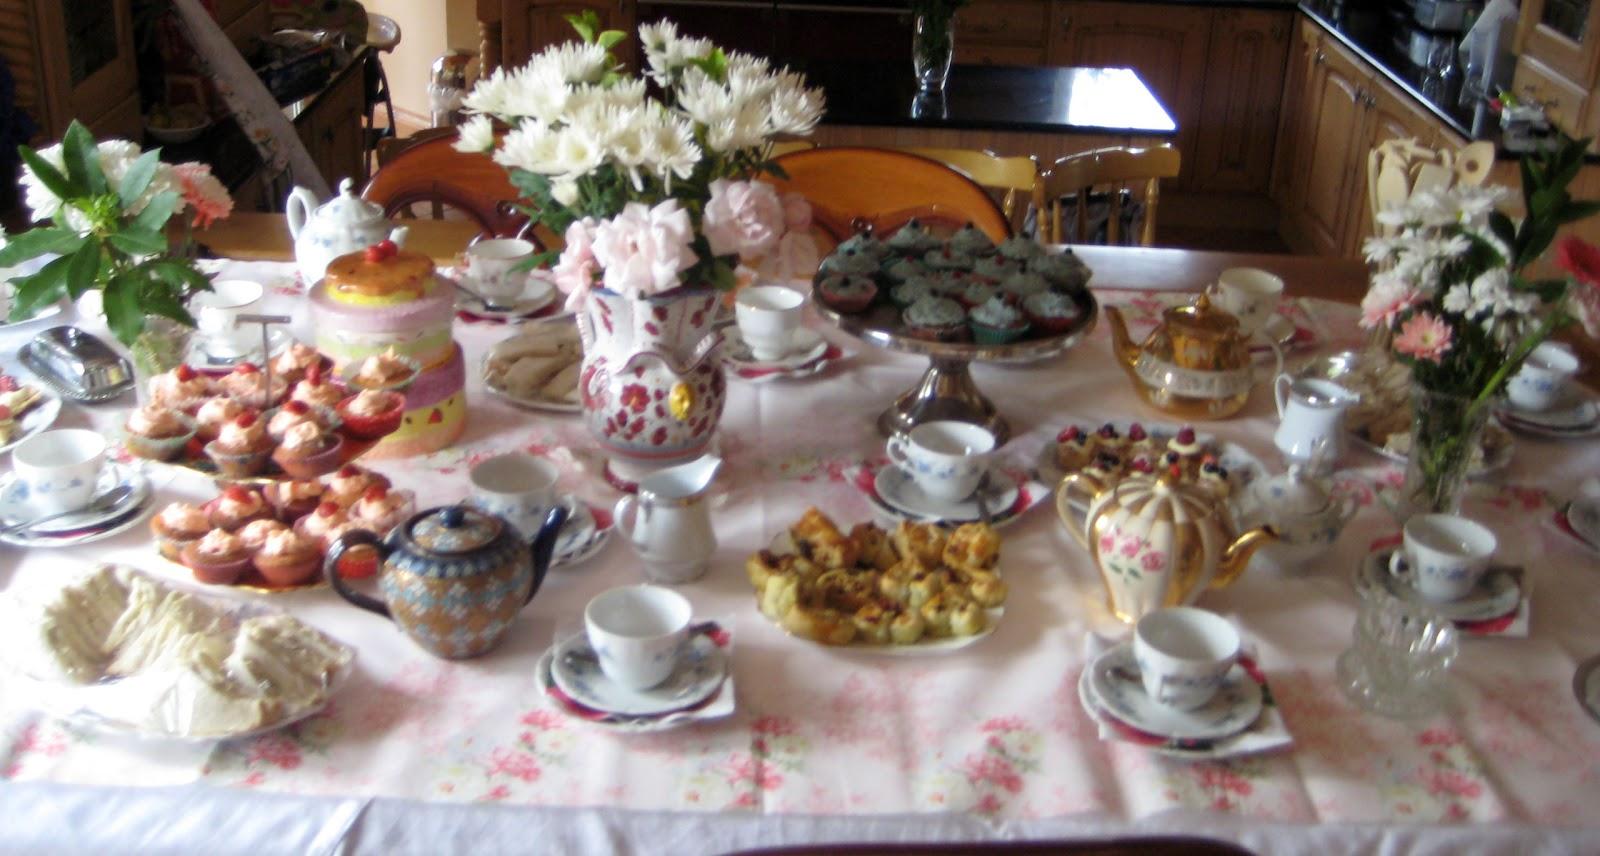 Teaparty: Serena's Medium Rare: Old Fashioned Tea Party